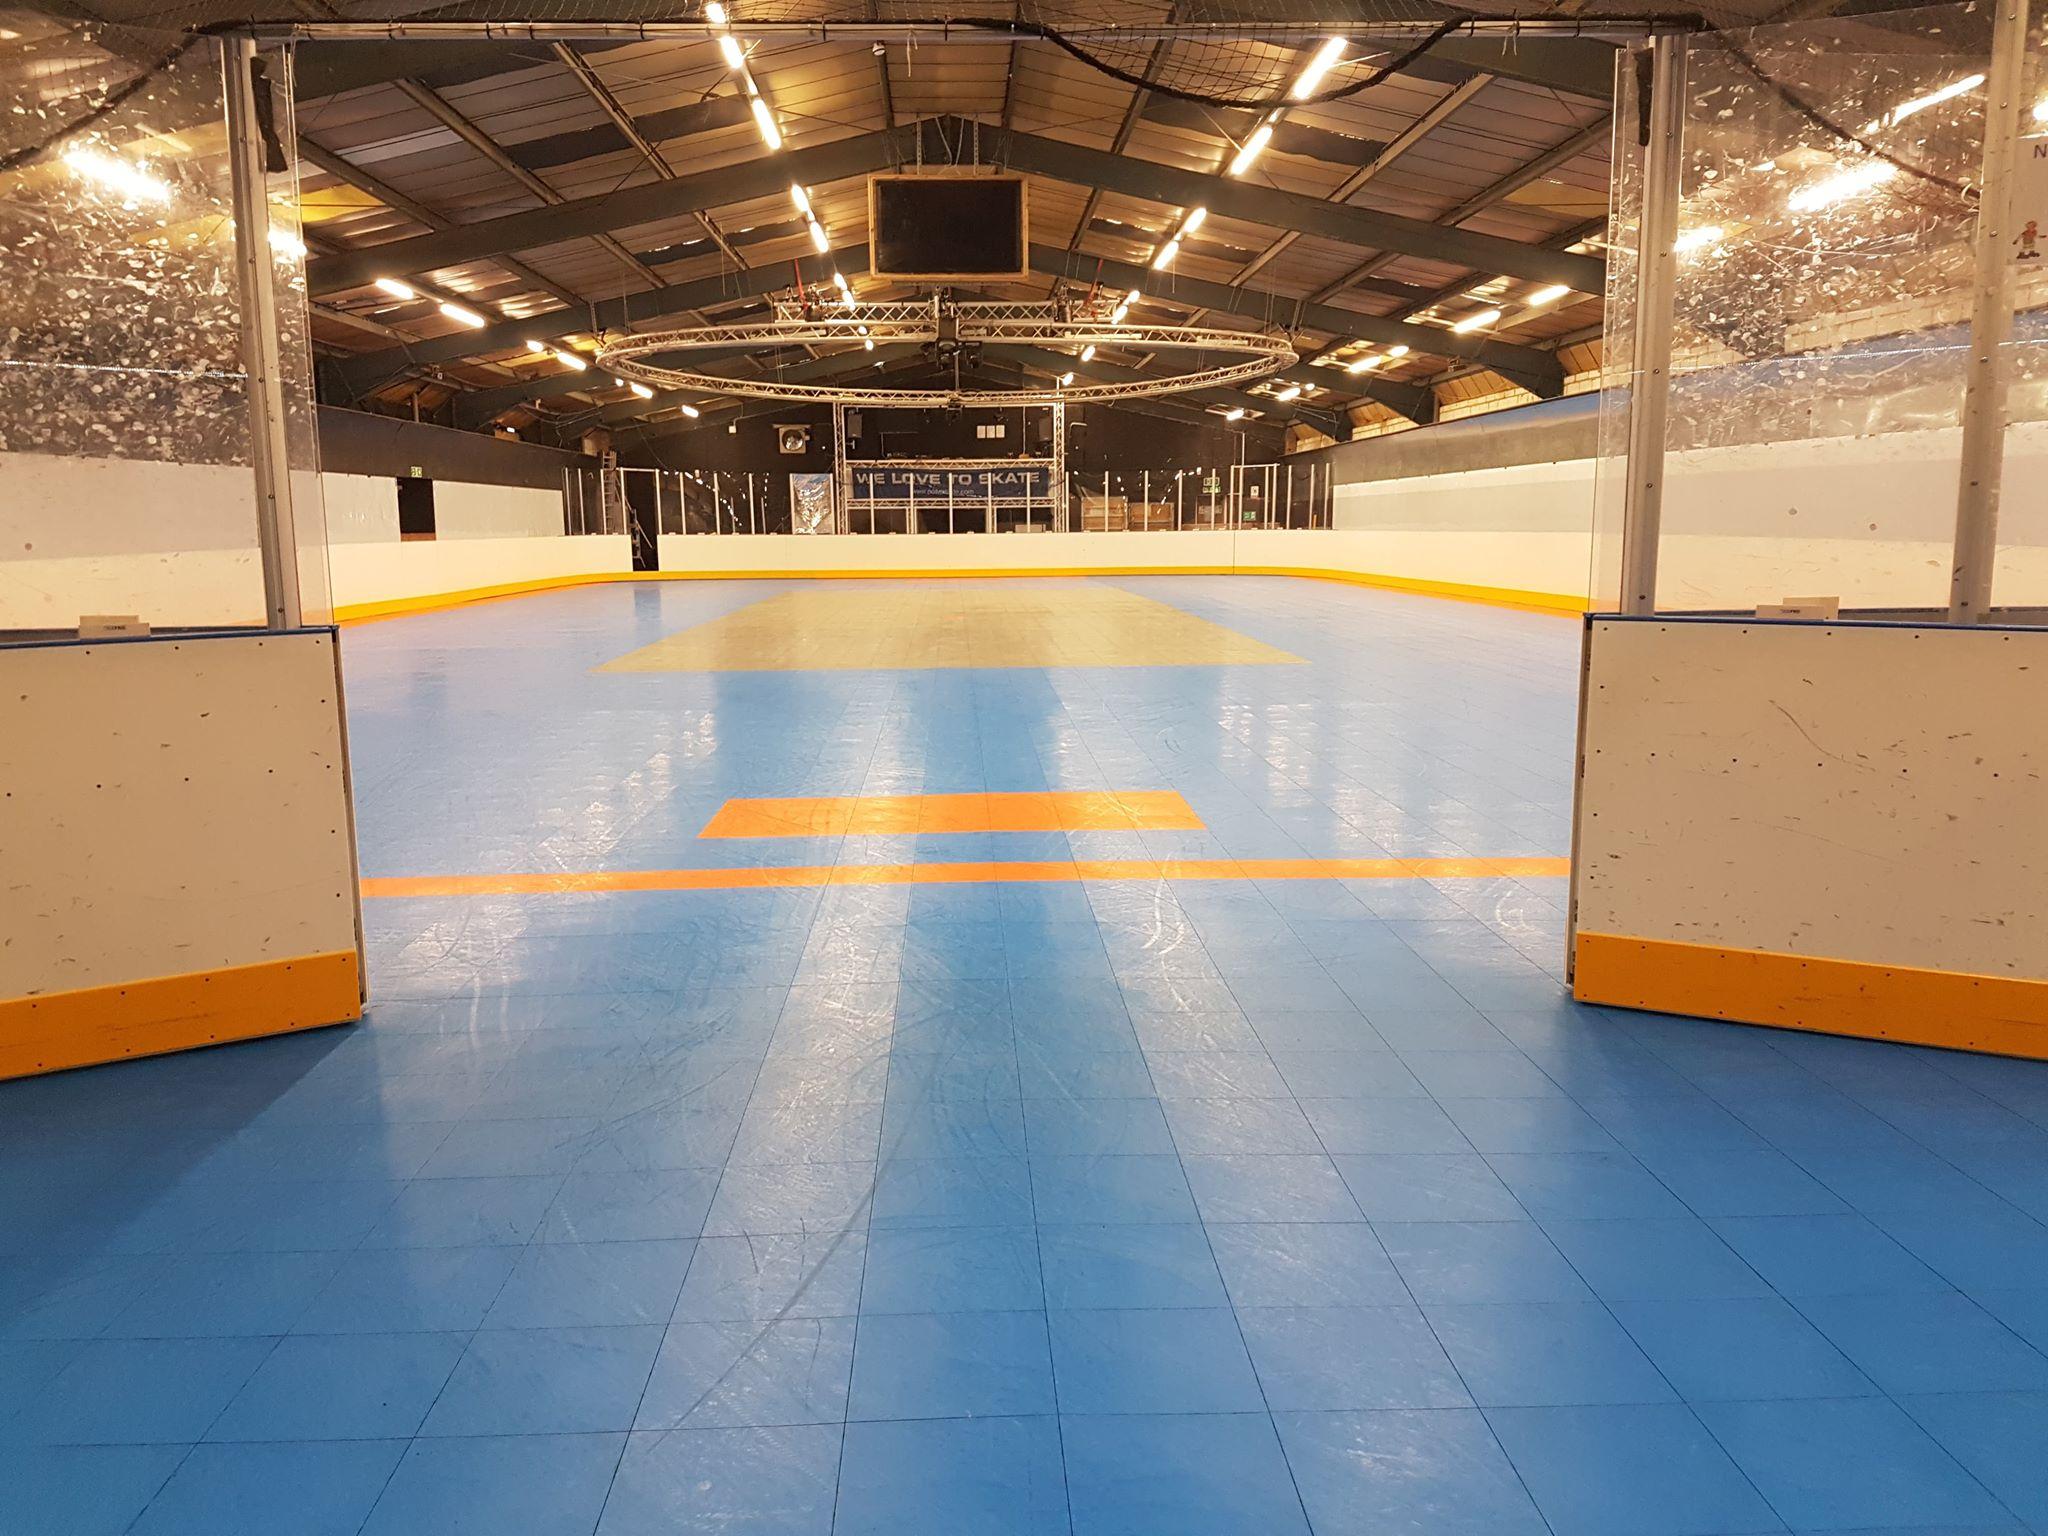 smooth running floor space